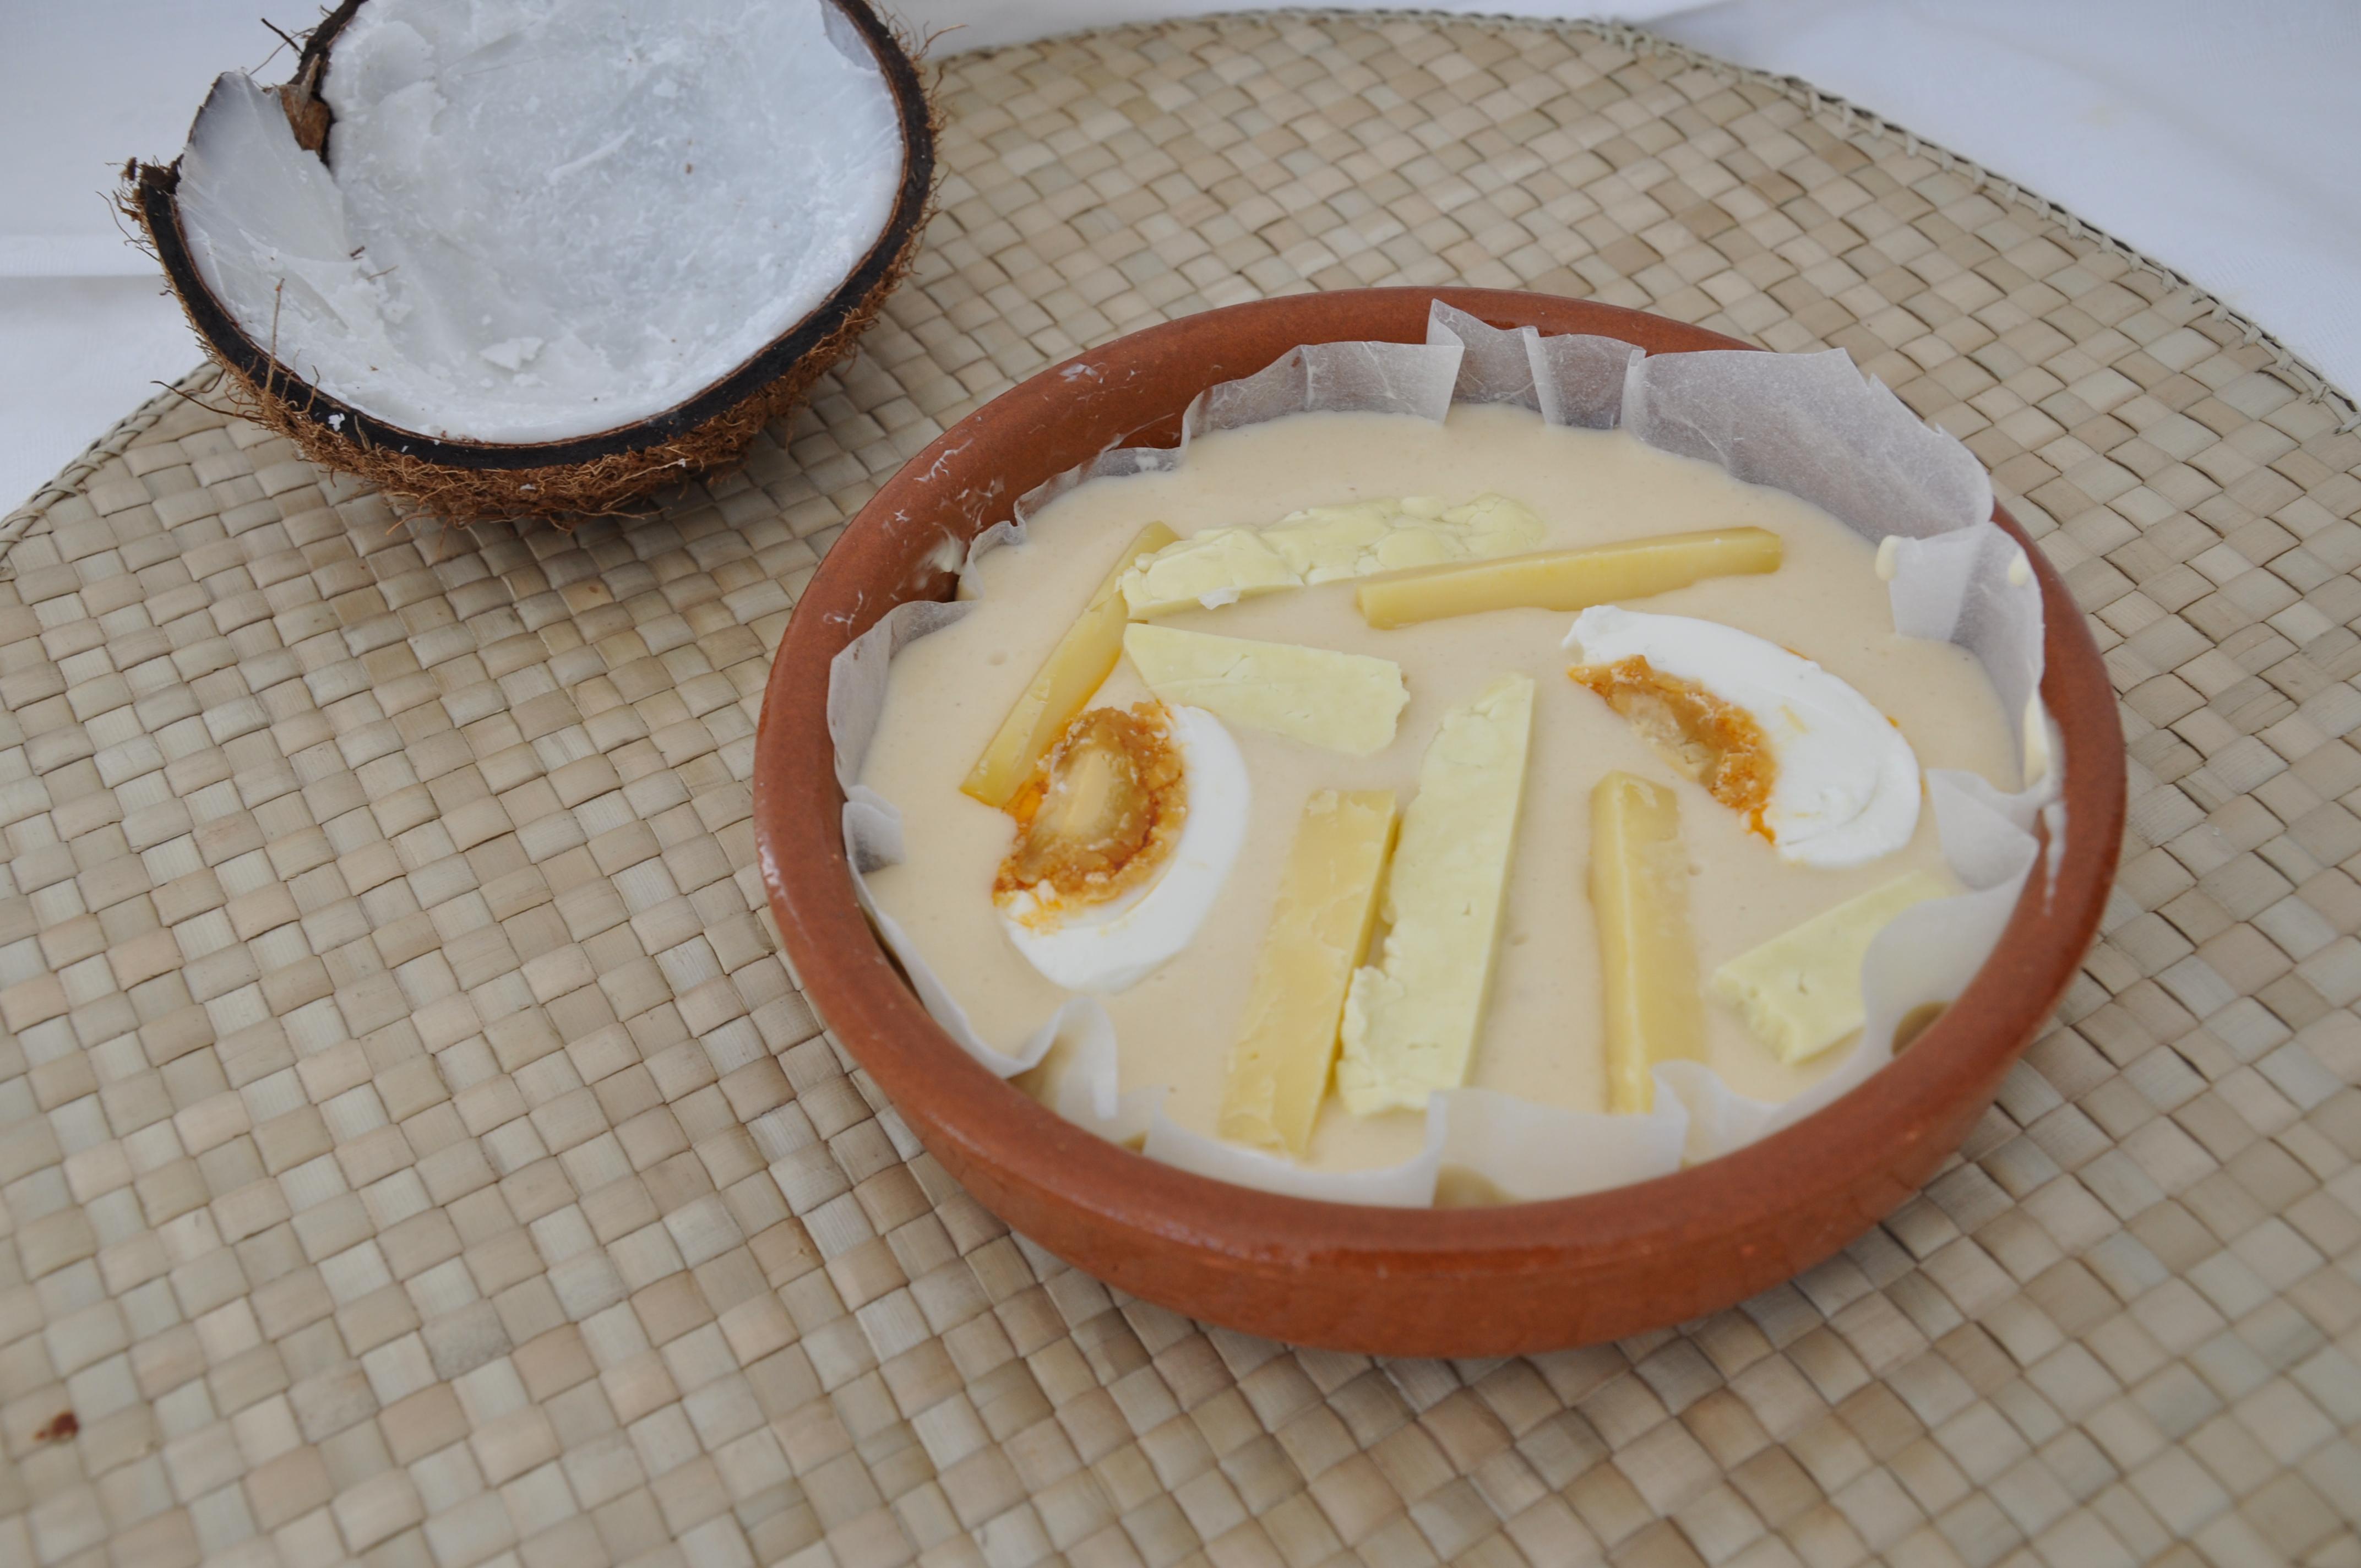 The Bibingka batter before baking